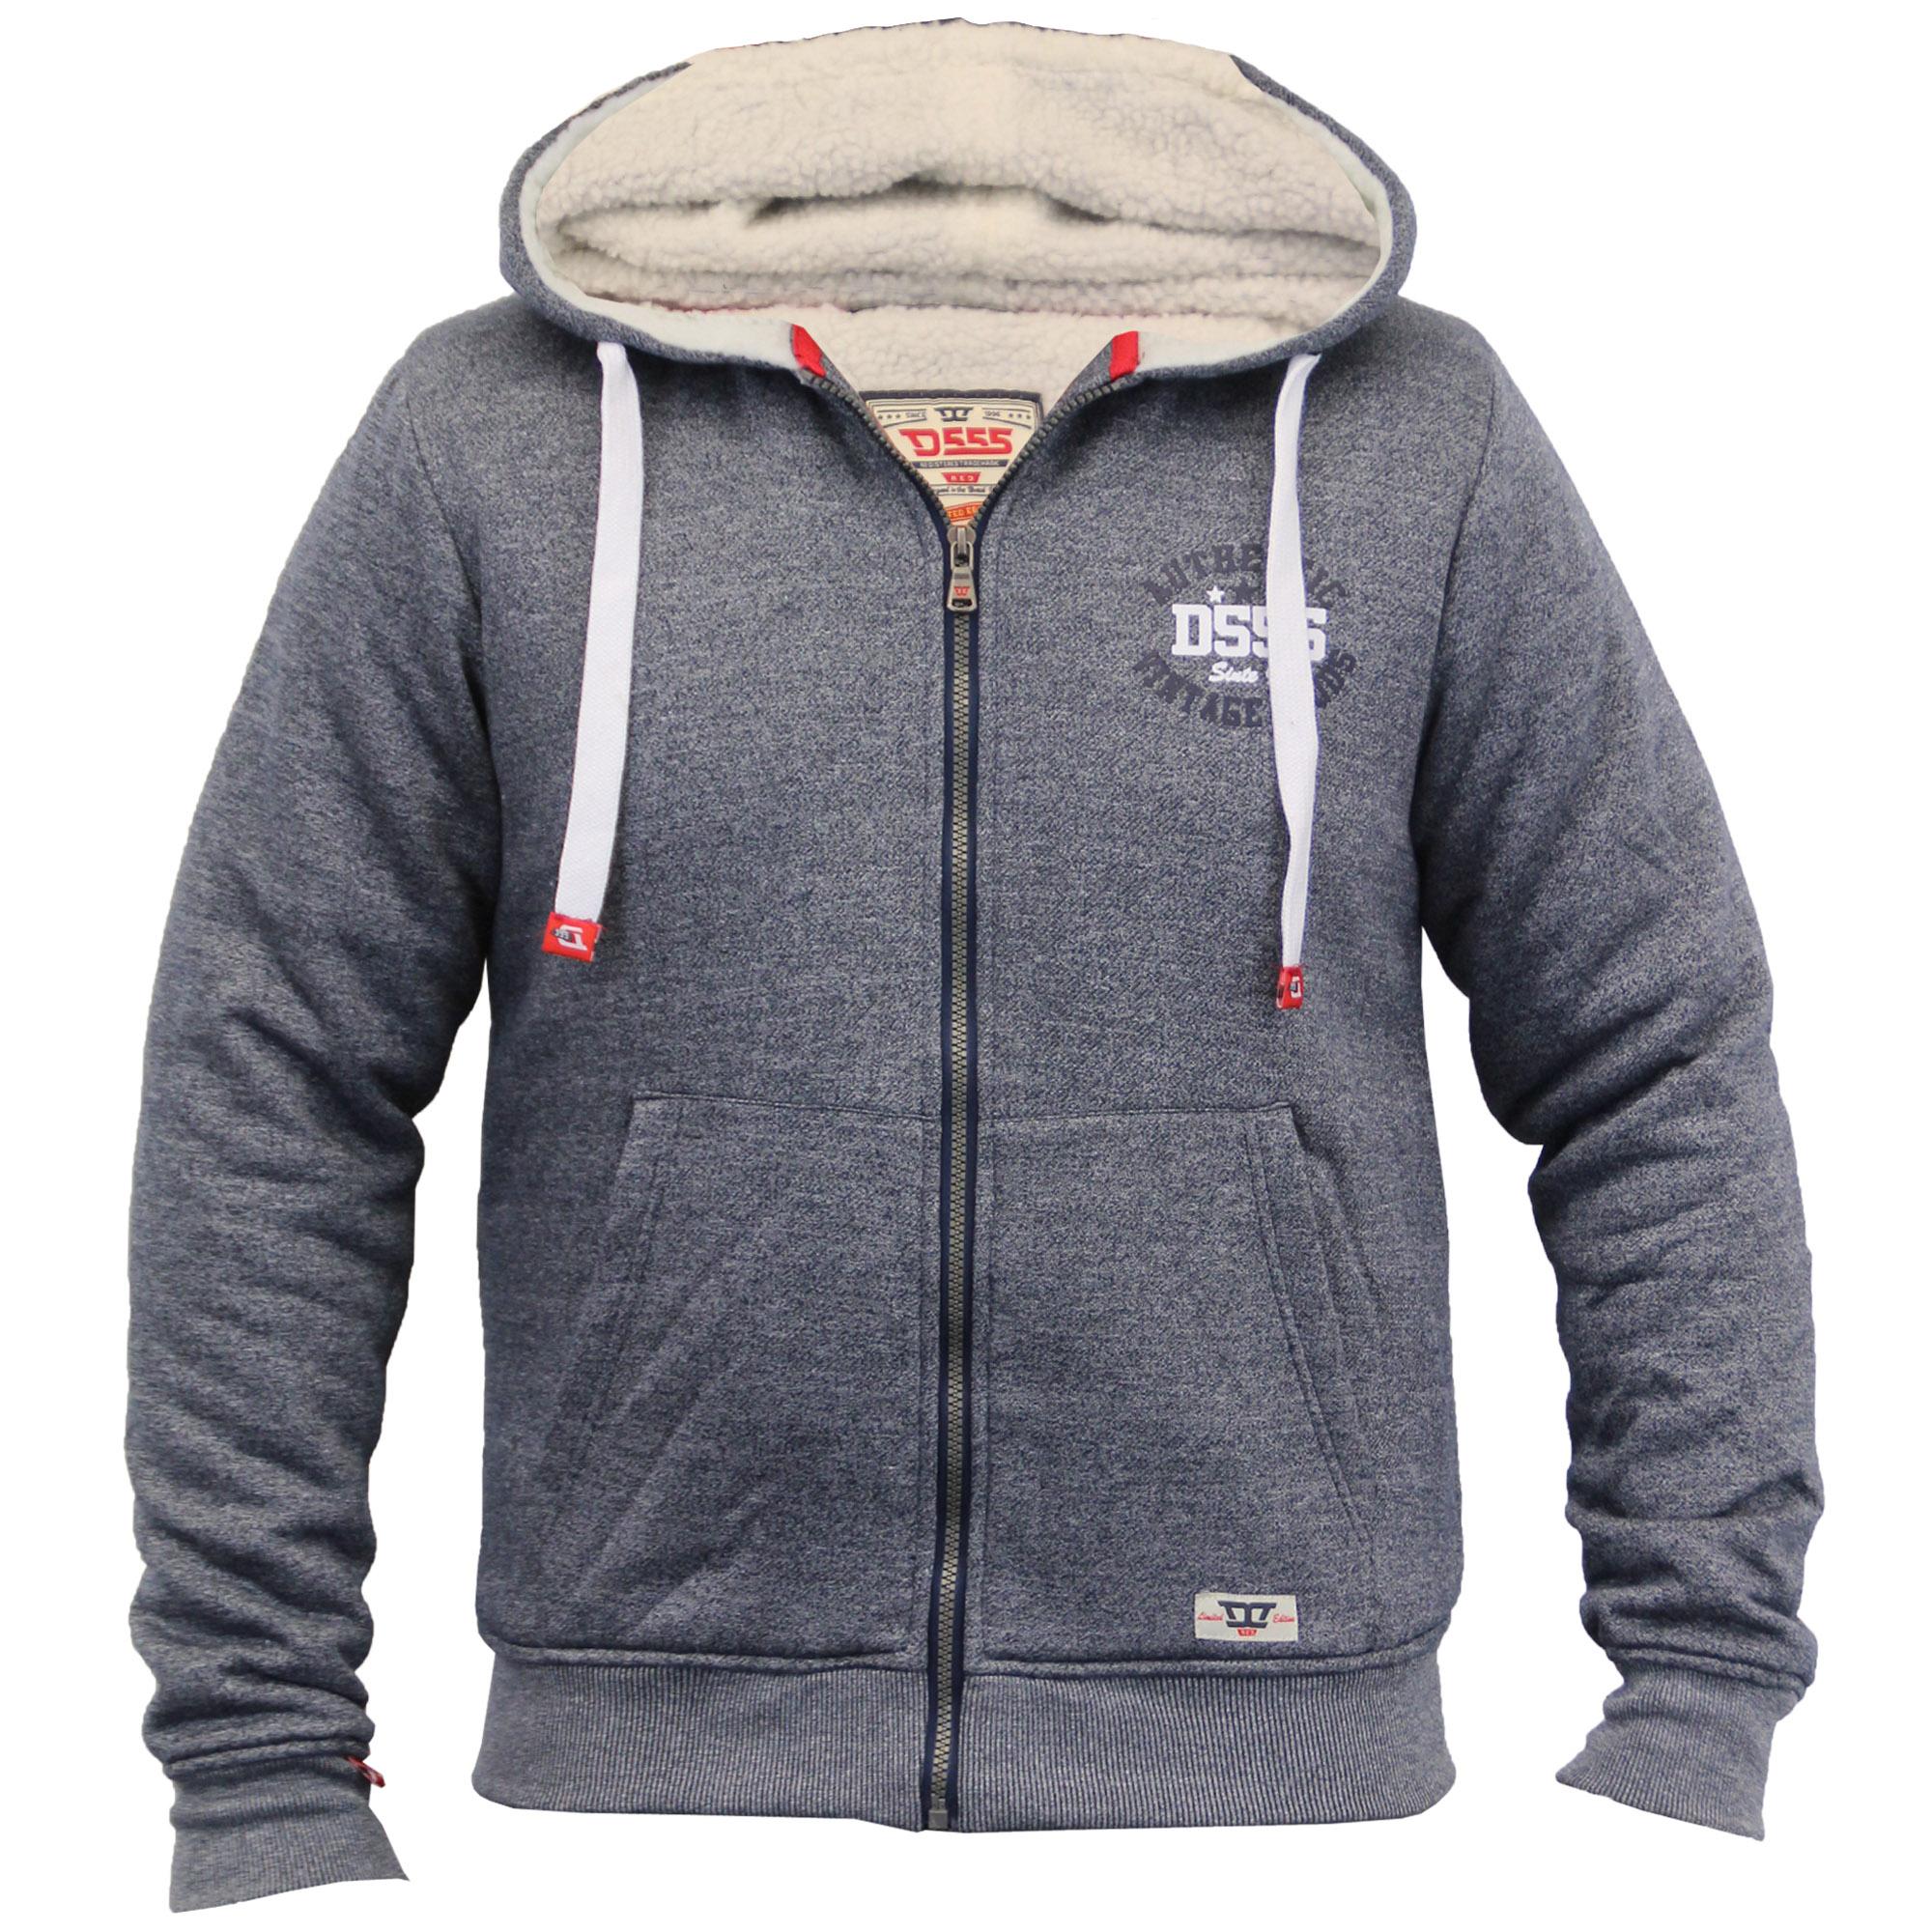 Mens Jacket D555 Duke Sweat Coat Hooded Big King Size ...